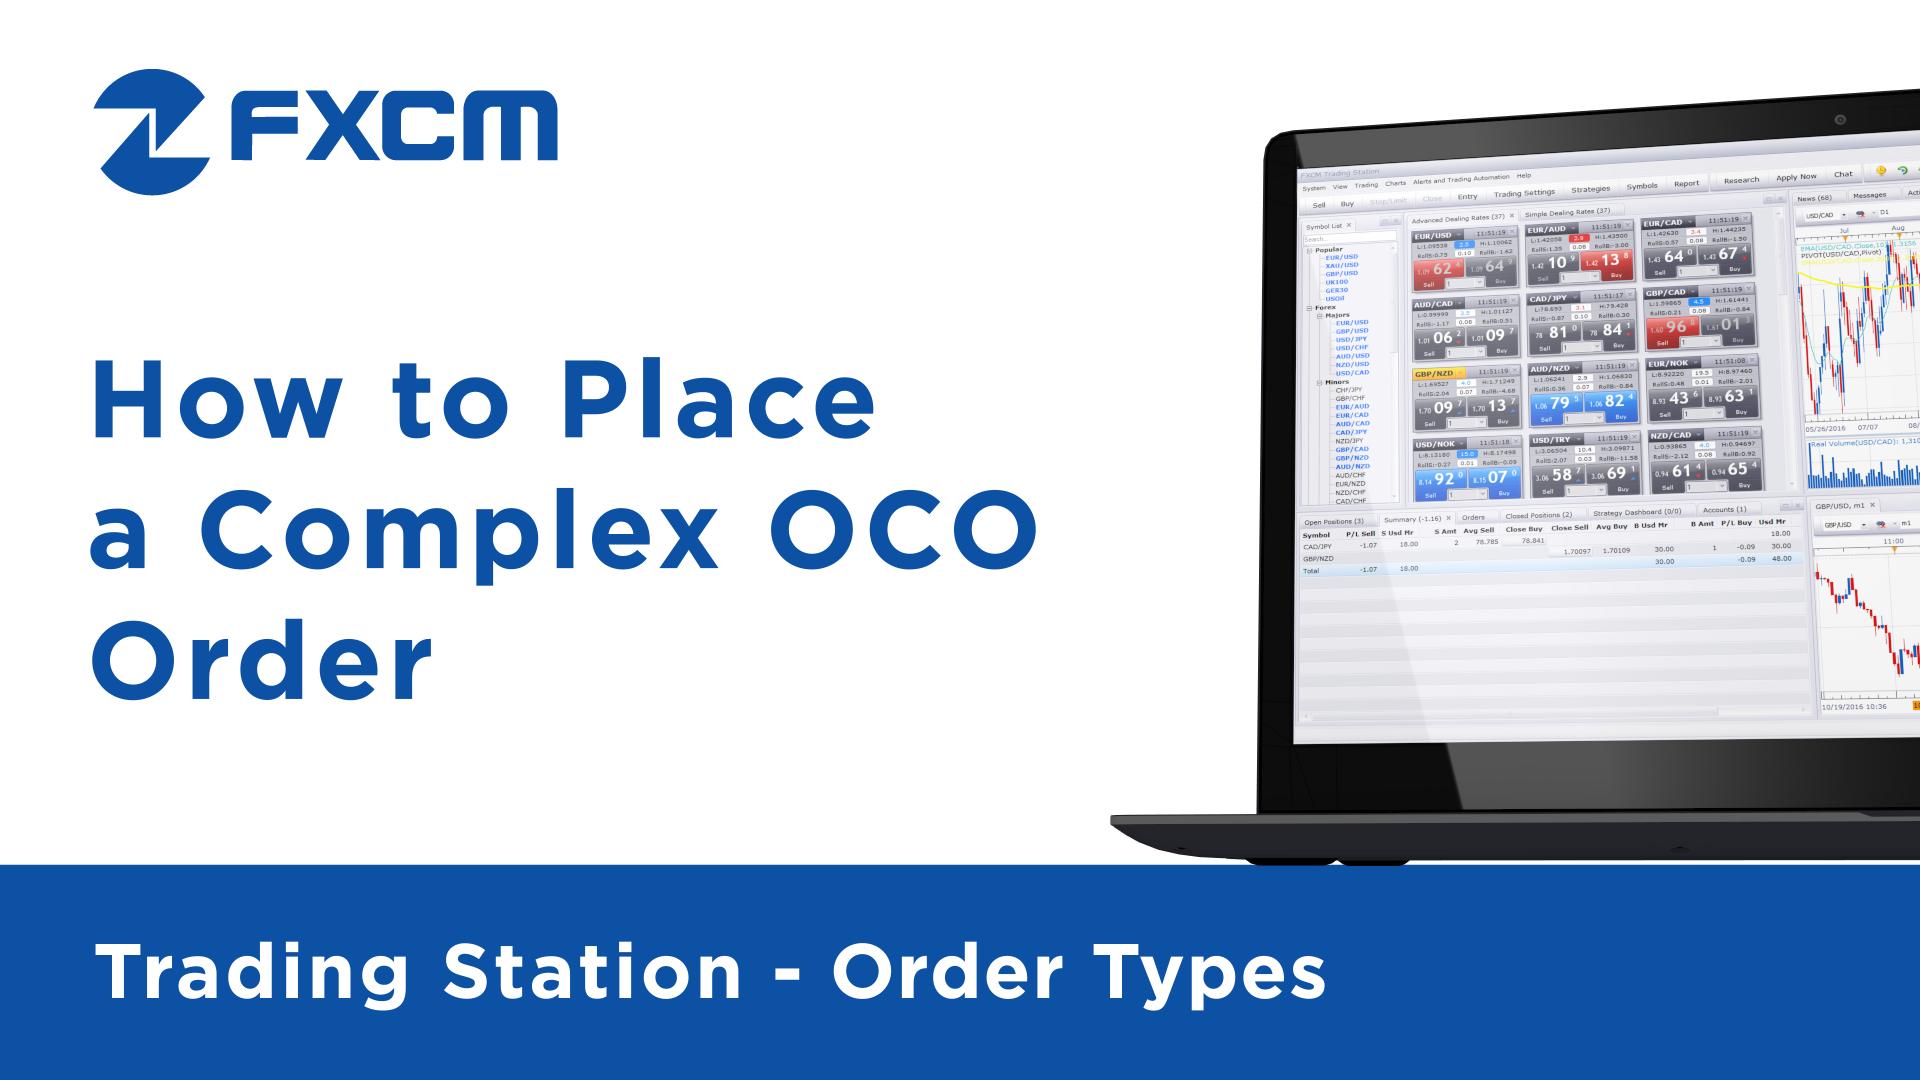 Complex OCO Orders